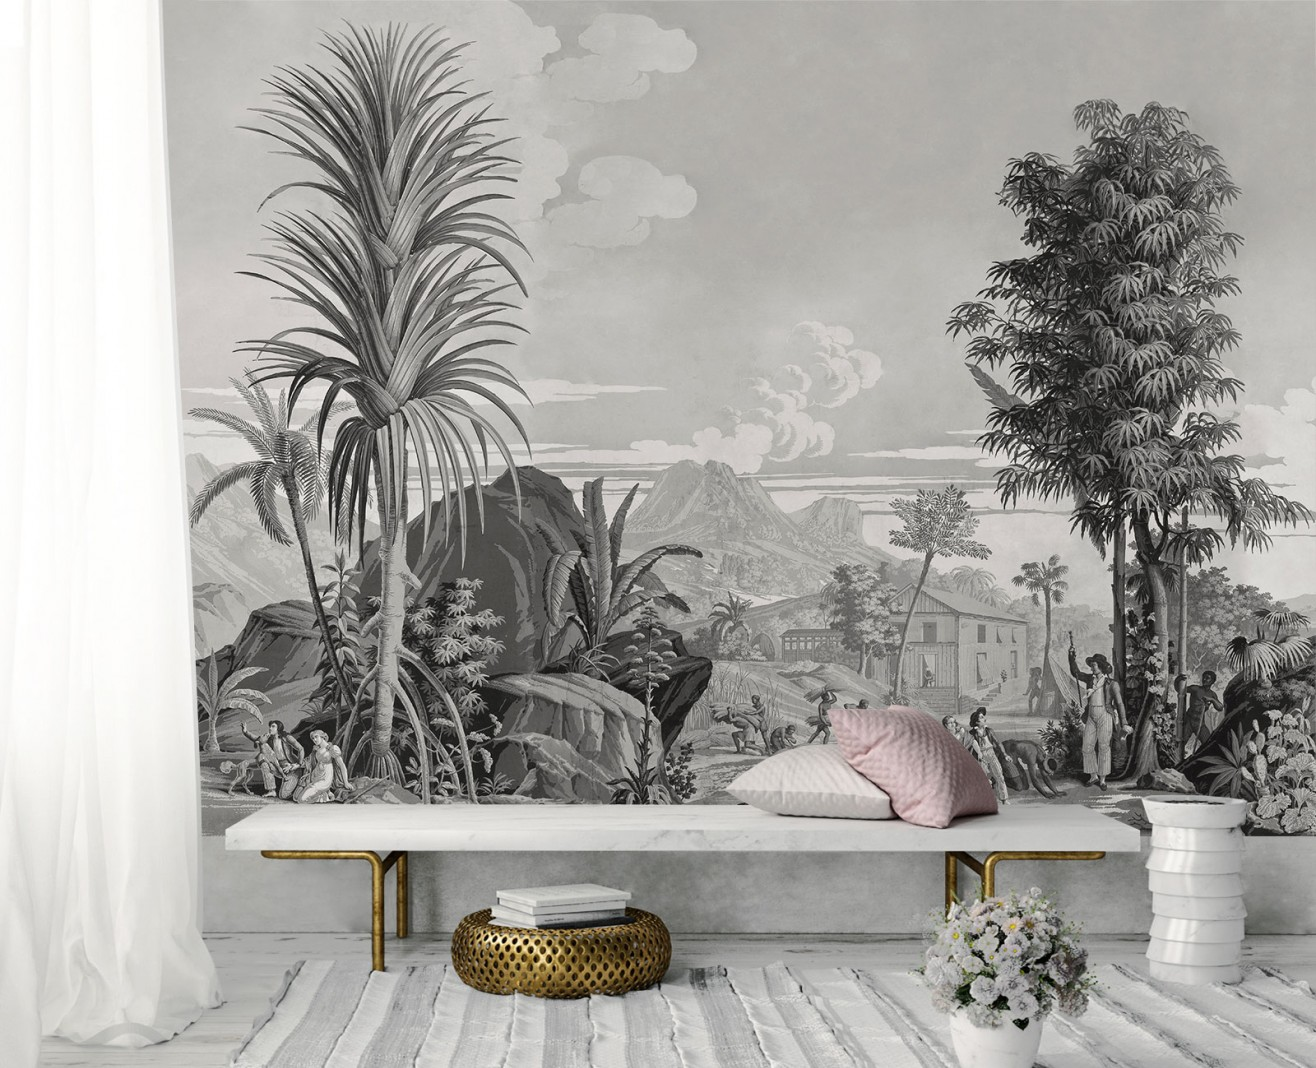 Panoramique Paul et Virginie monochrome . 1824